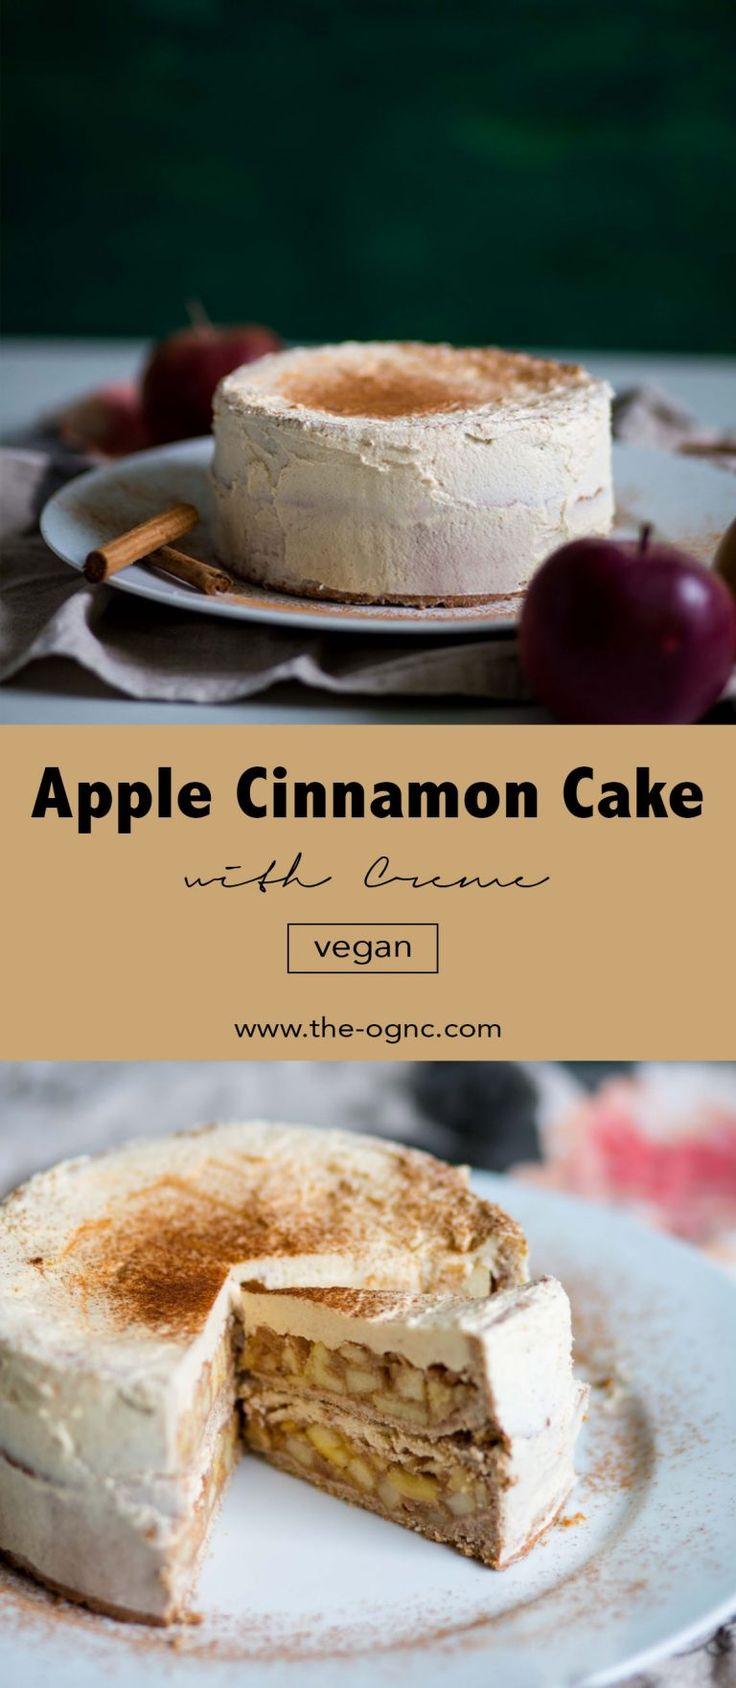 Vegan Apple Cinnamon Cake with Cream